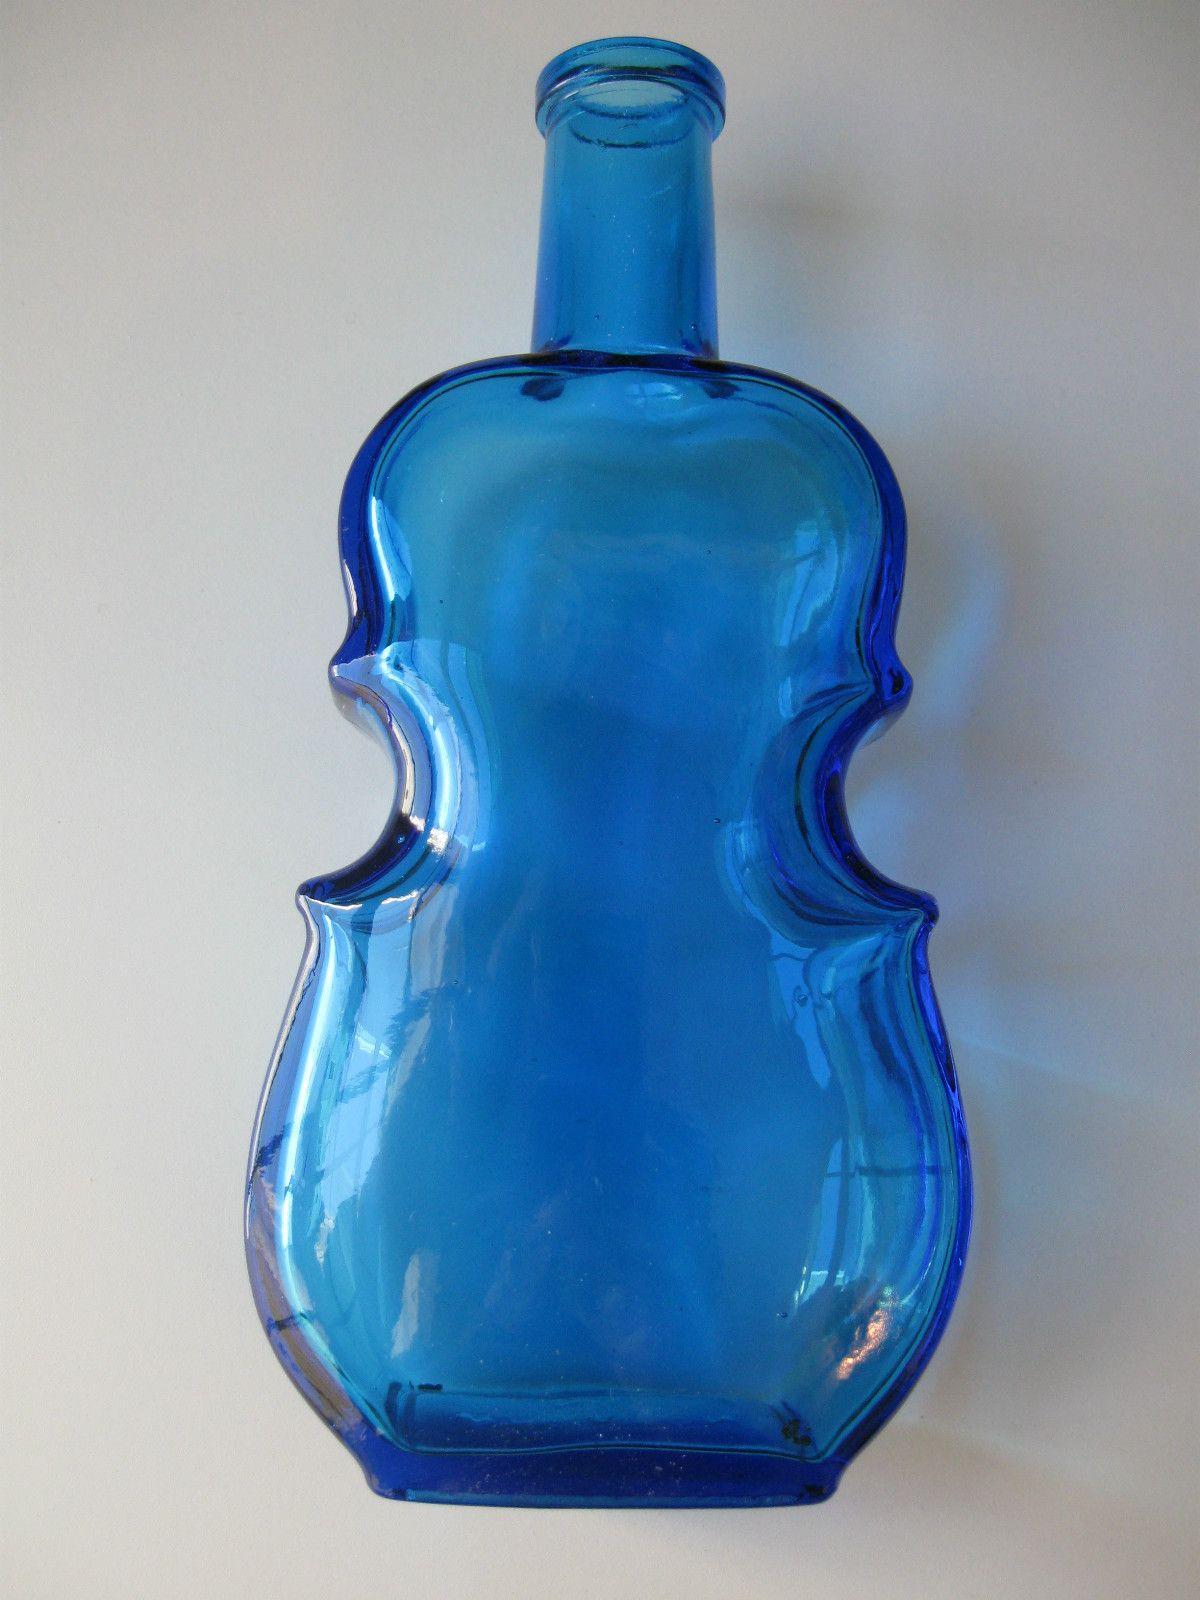 Wheaton glass violin shaped bottle peacock blue 7 1 2 ebay wheaton glass violin shaped bottle peacock blue 7 1 2 ebay reviewsmspy